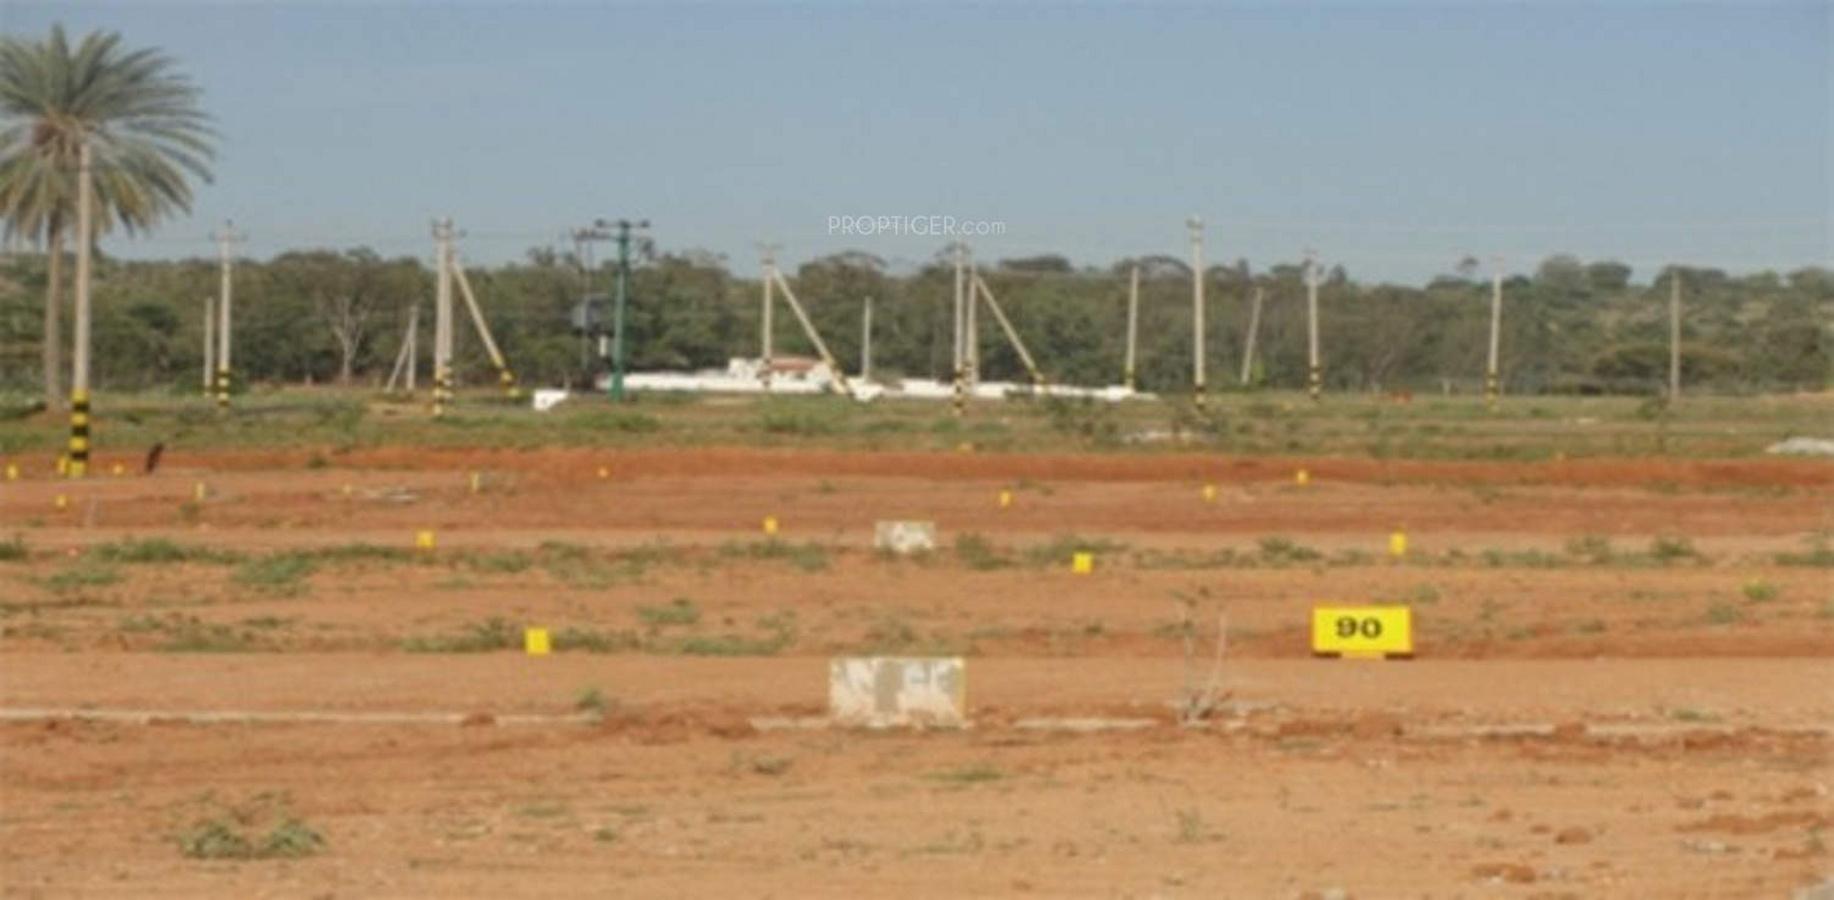 Real Estate Land : Sq ft plot for sale in green wealth estate ashok